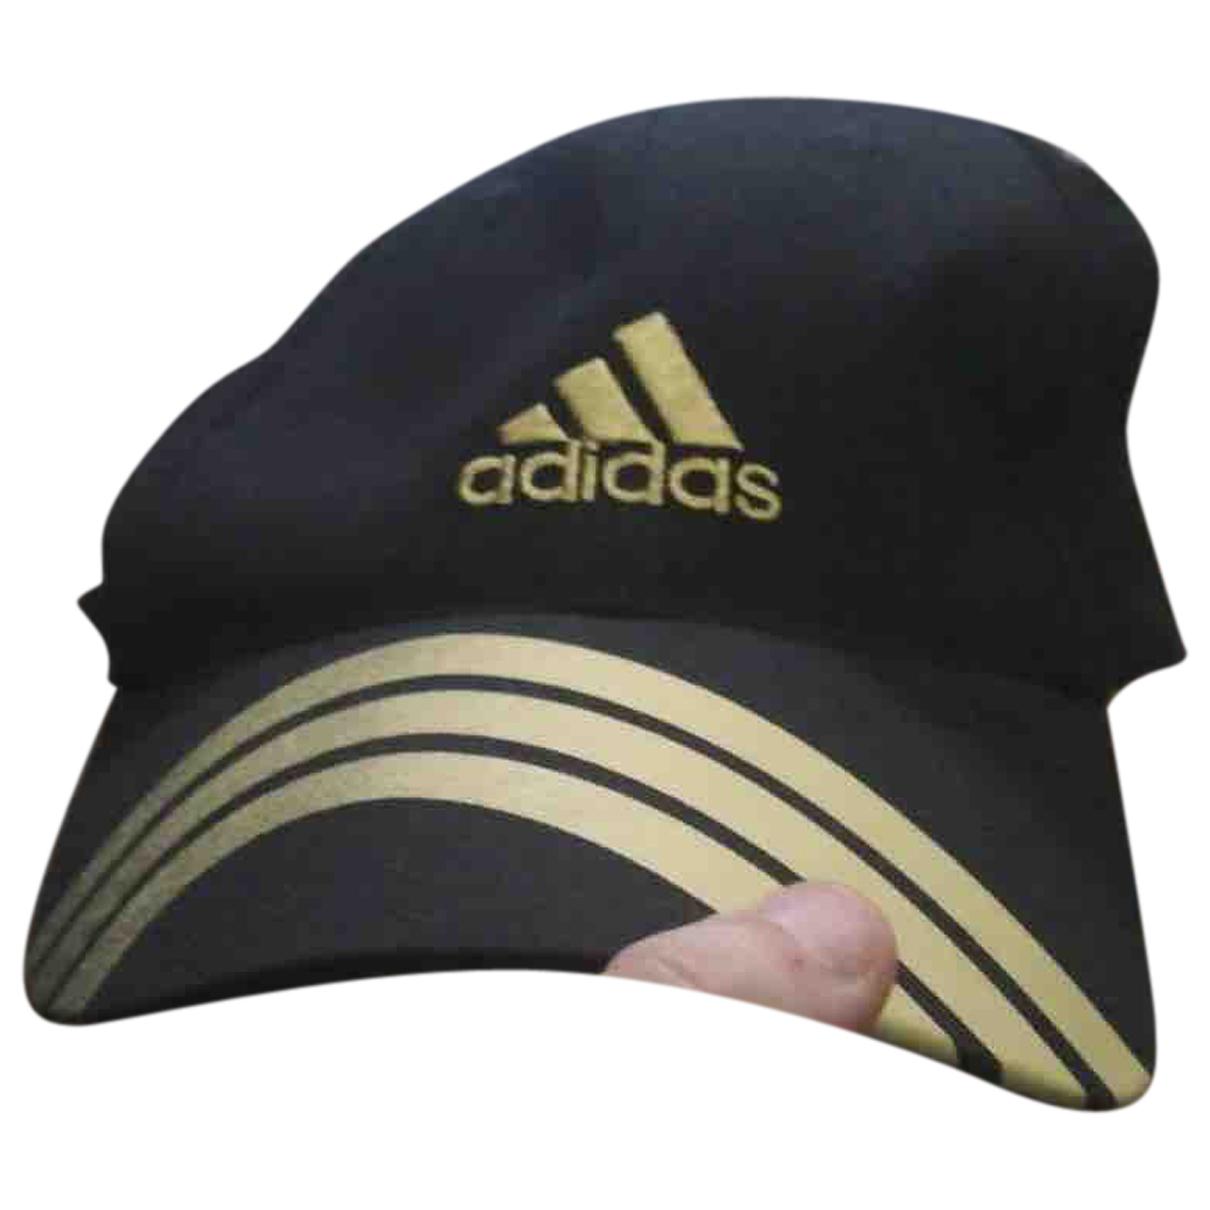 Adidas N Black Cotton hat & pull on hat for Men 57 cm